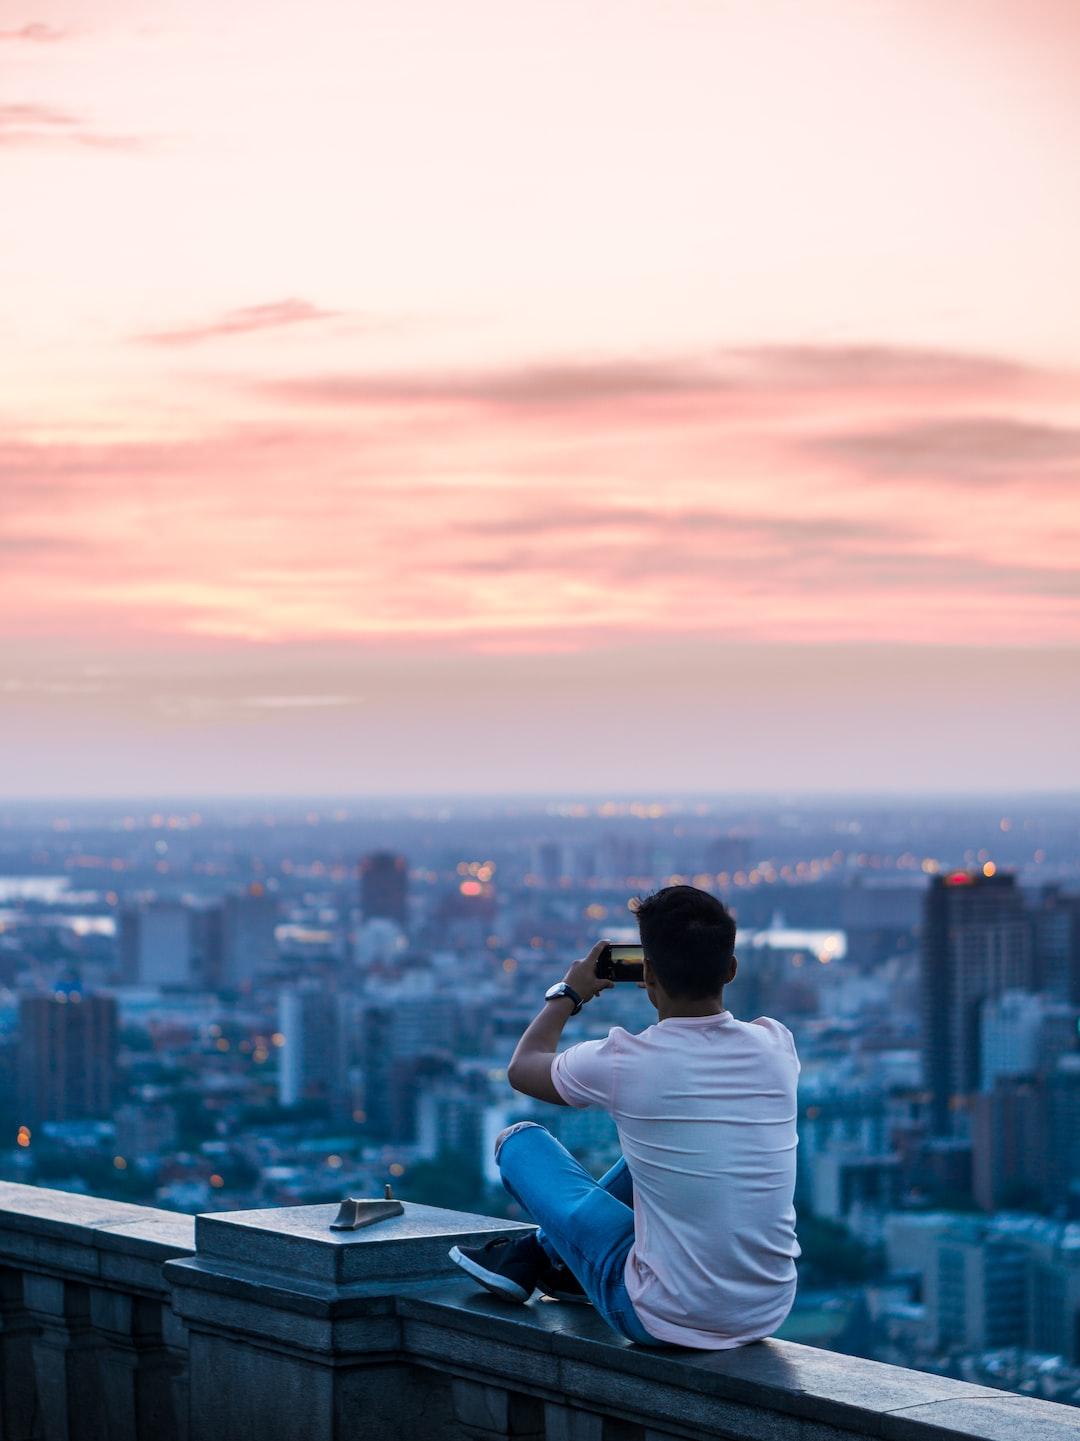 Man capturing skyline